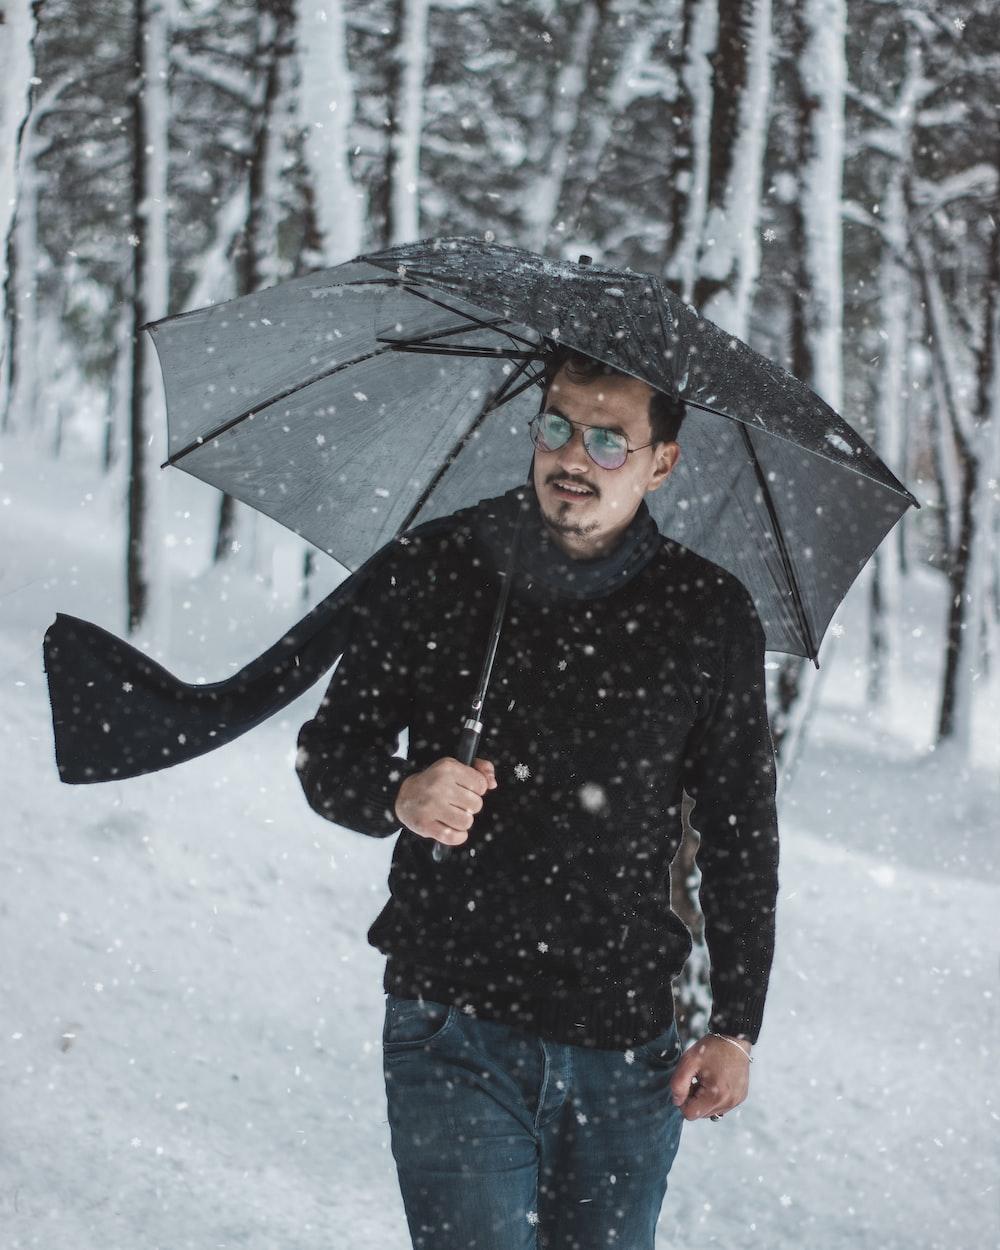 man holding umbrella outdoor during snowfall